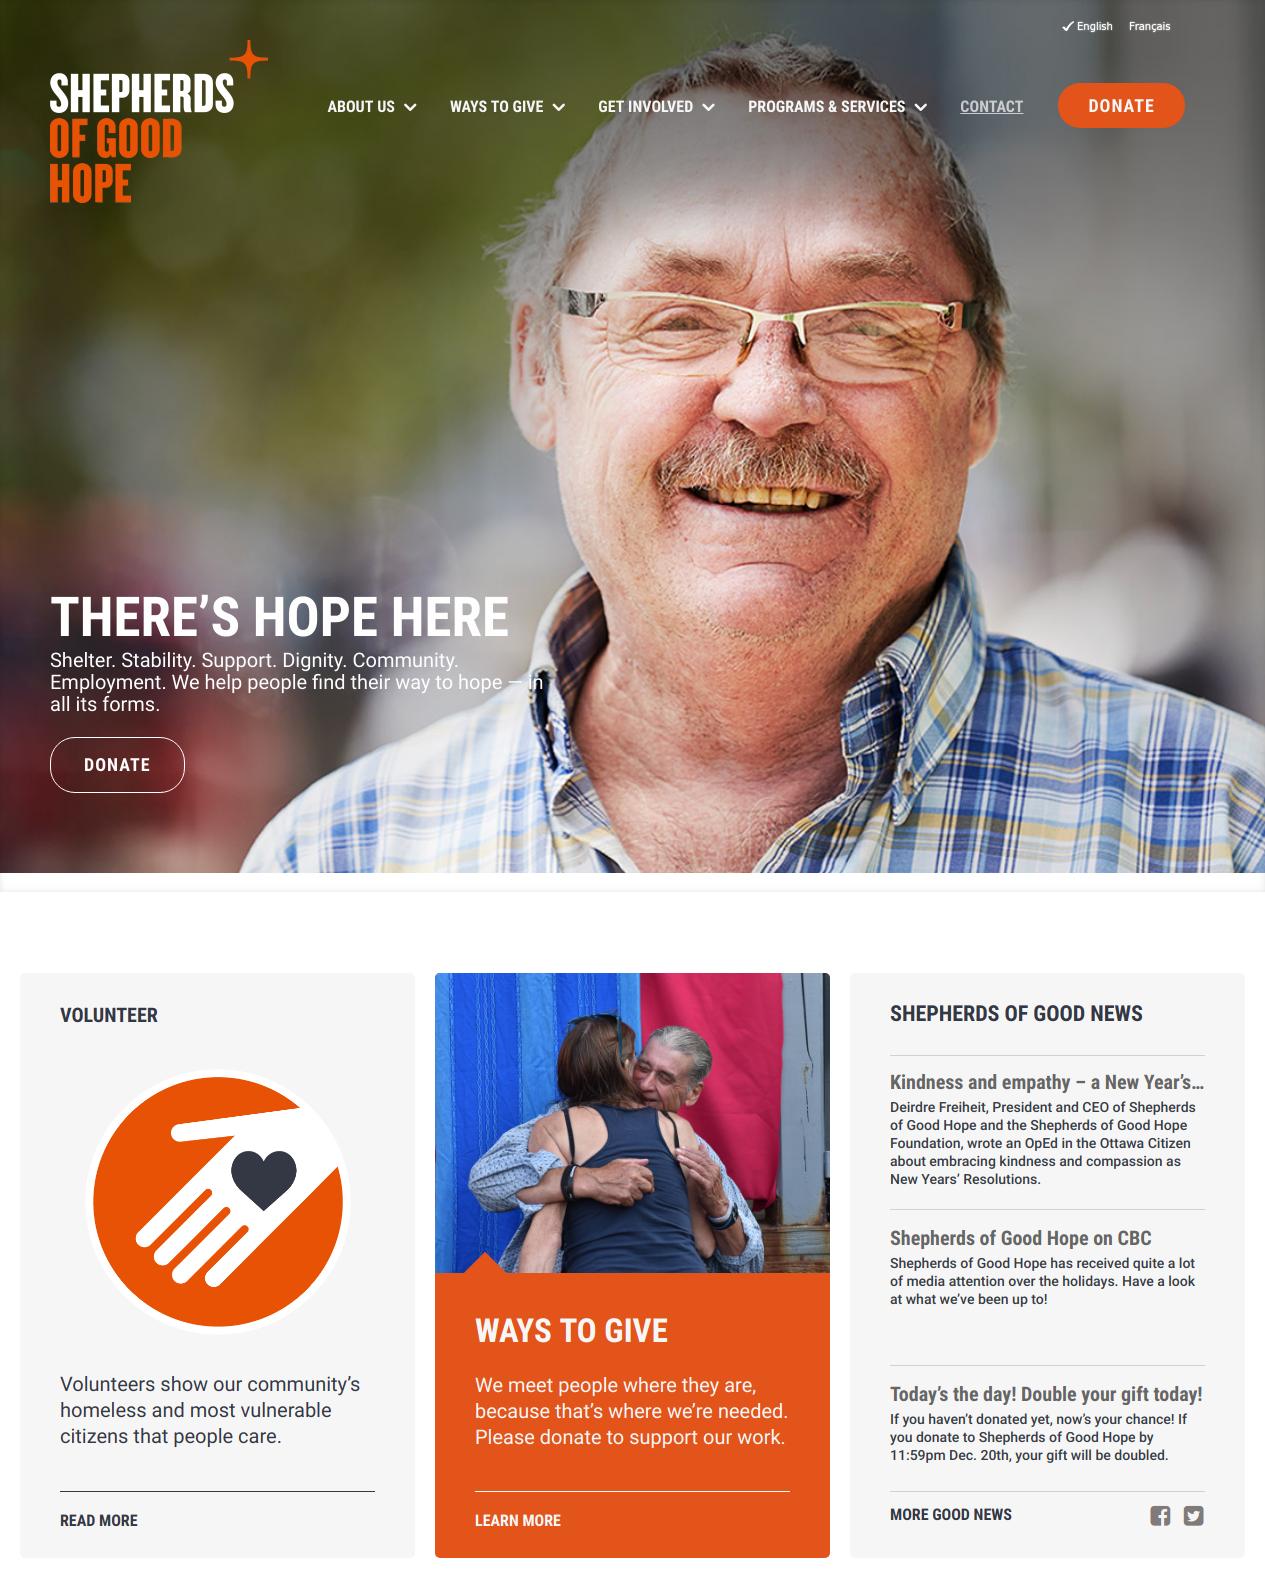 Shepherds of Good Hope Home Page (https://www.sghottawa.ca)